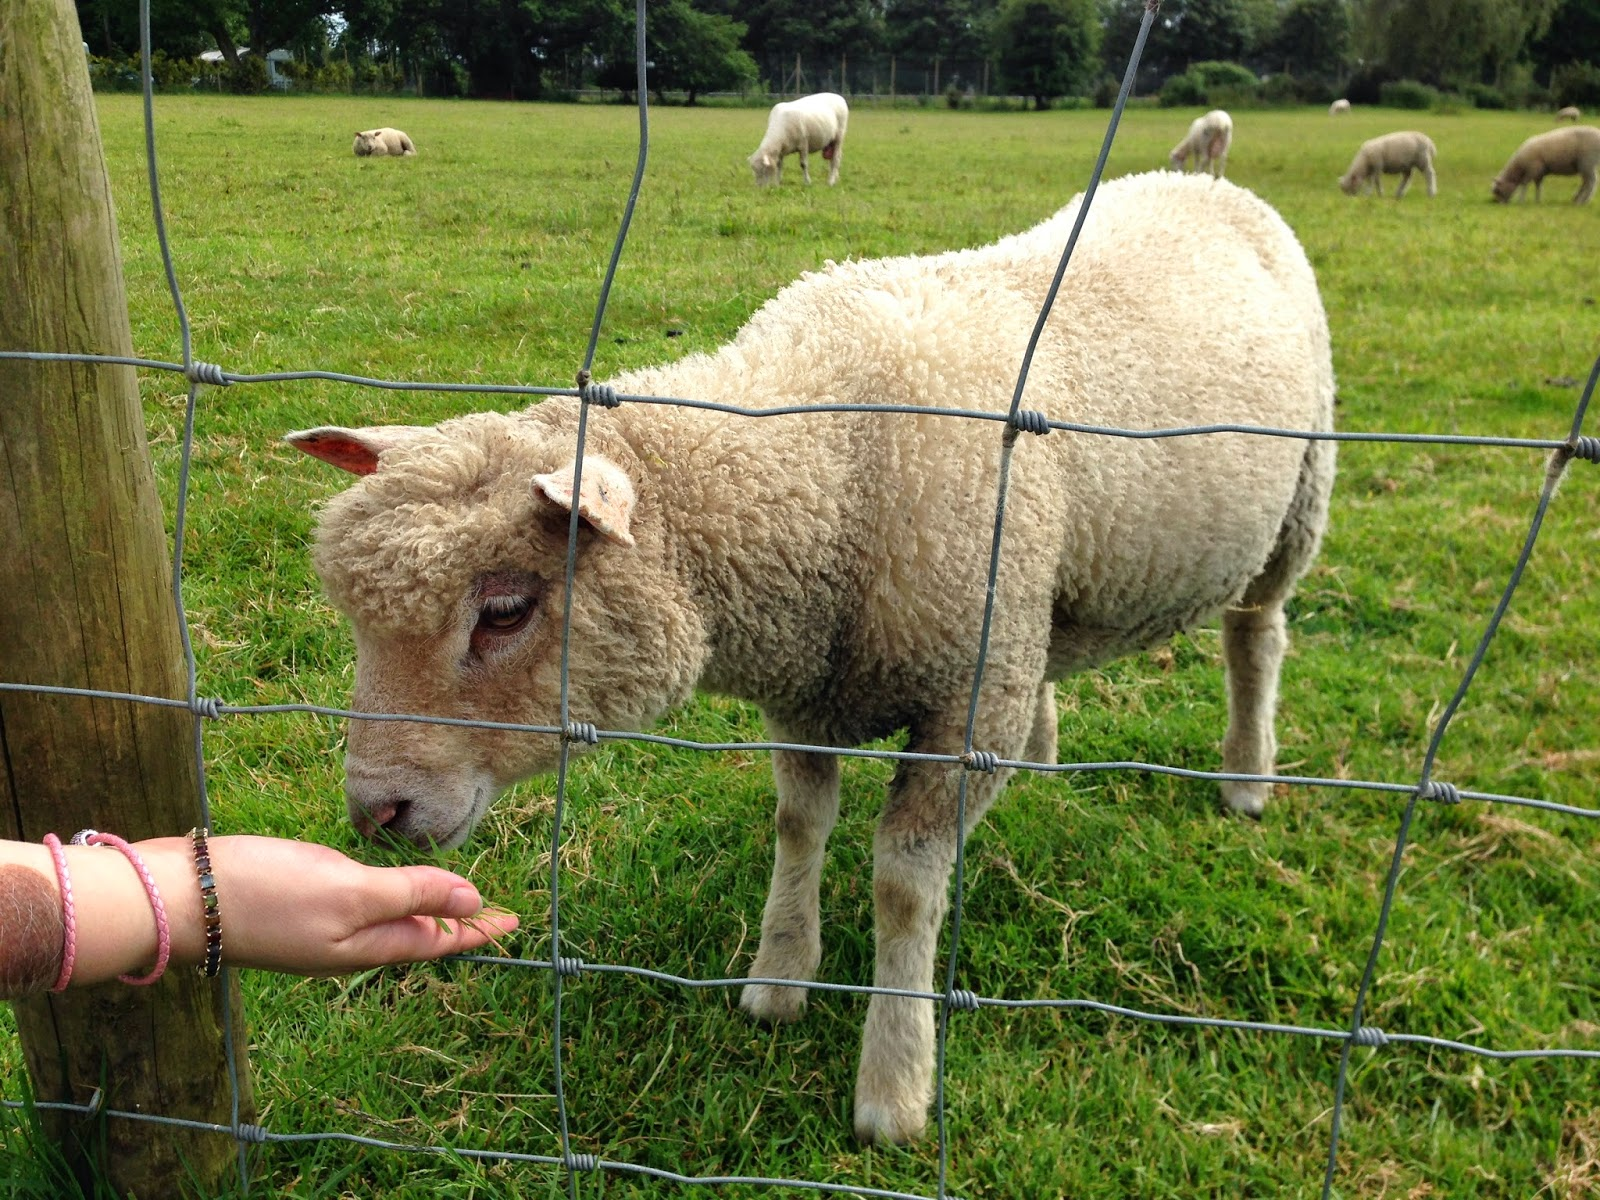 A sheep at Grundy's Farm